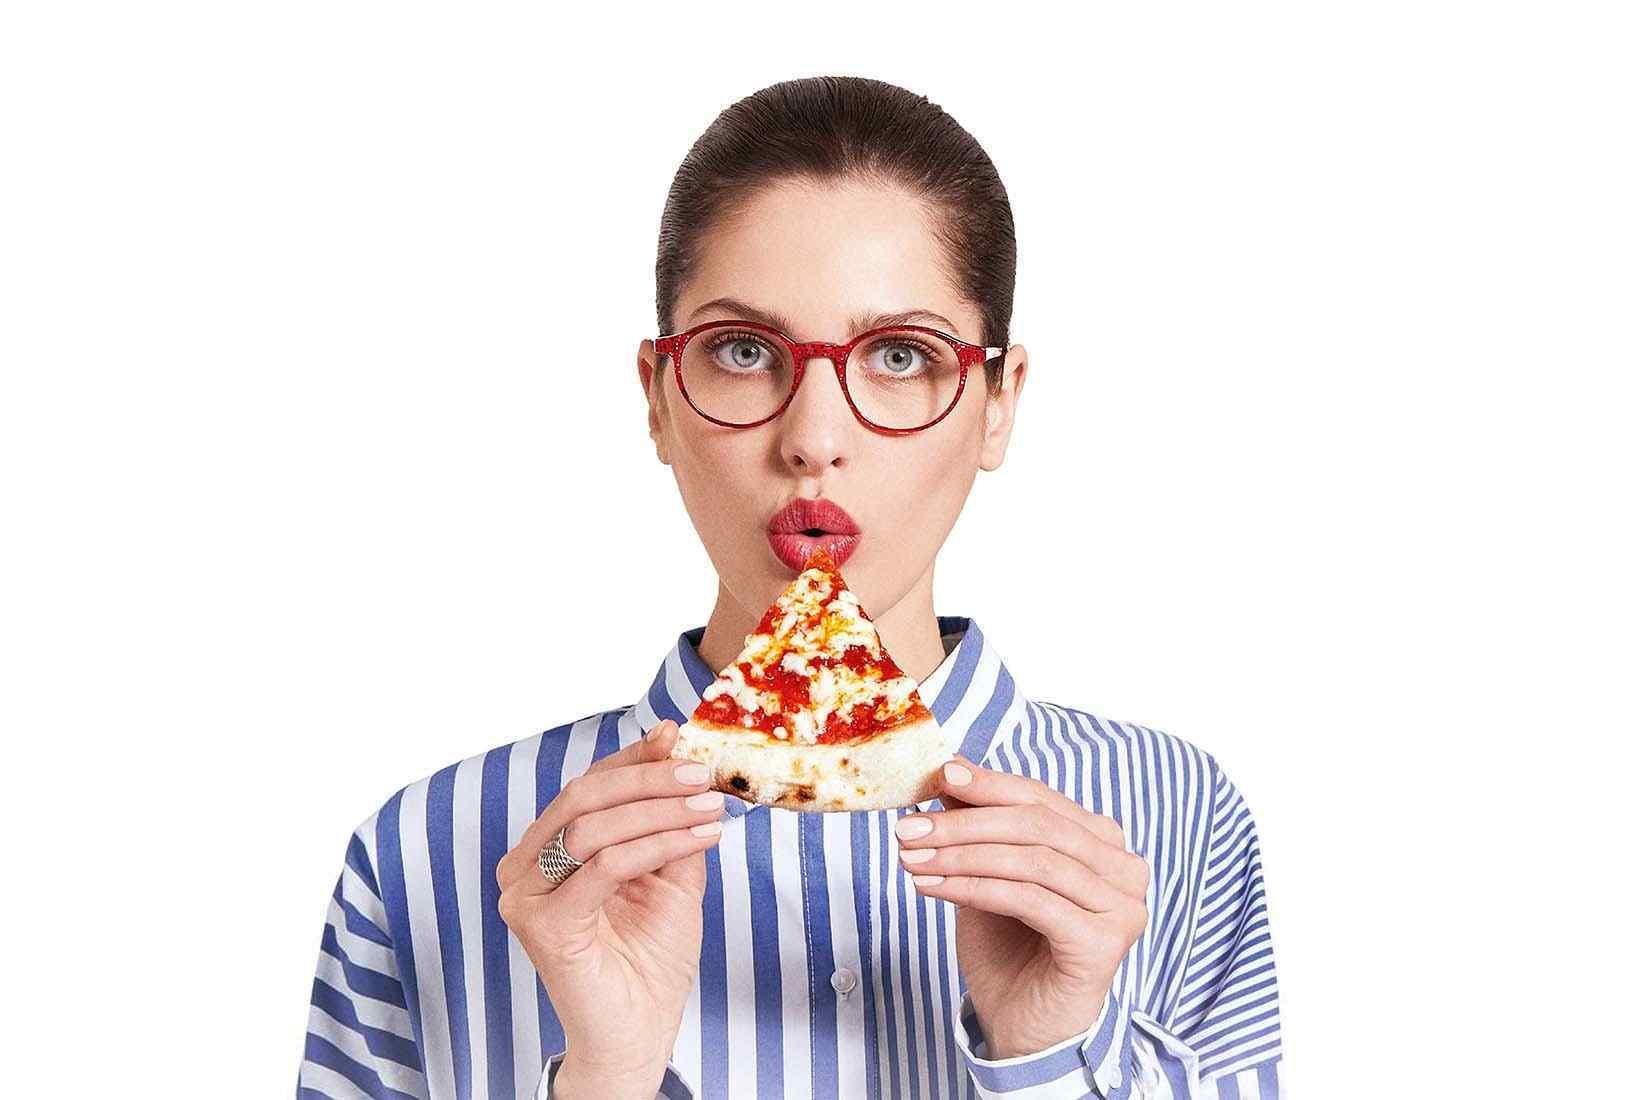 Vanni spectacles: Italian Food 20188 1650x1100